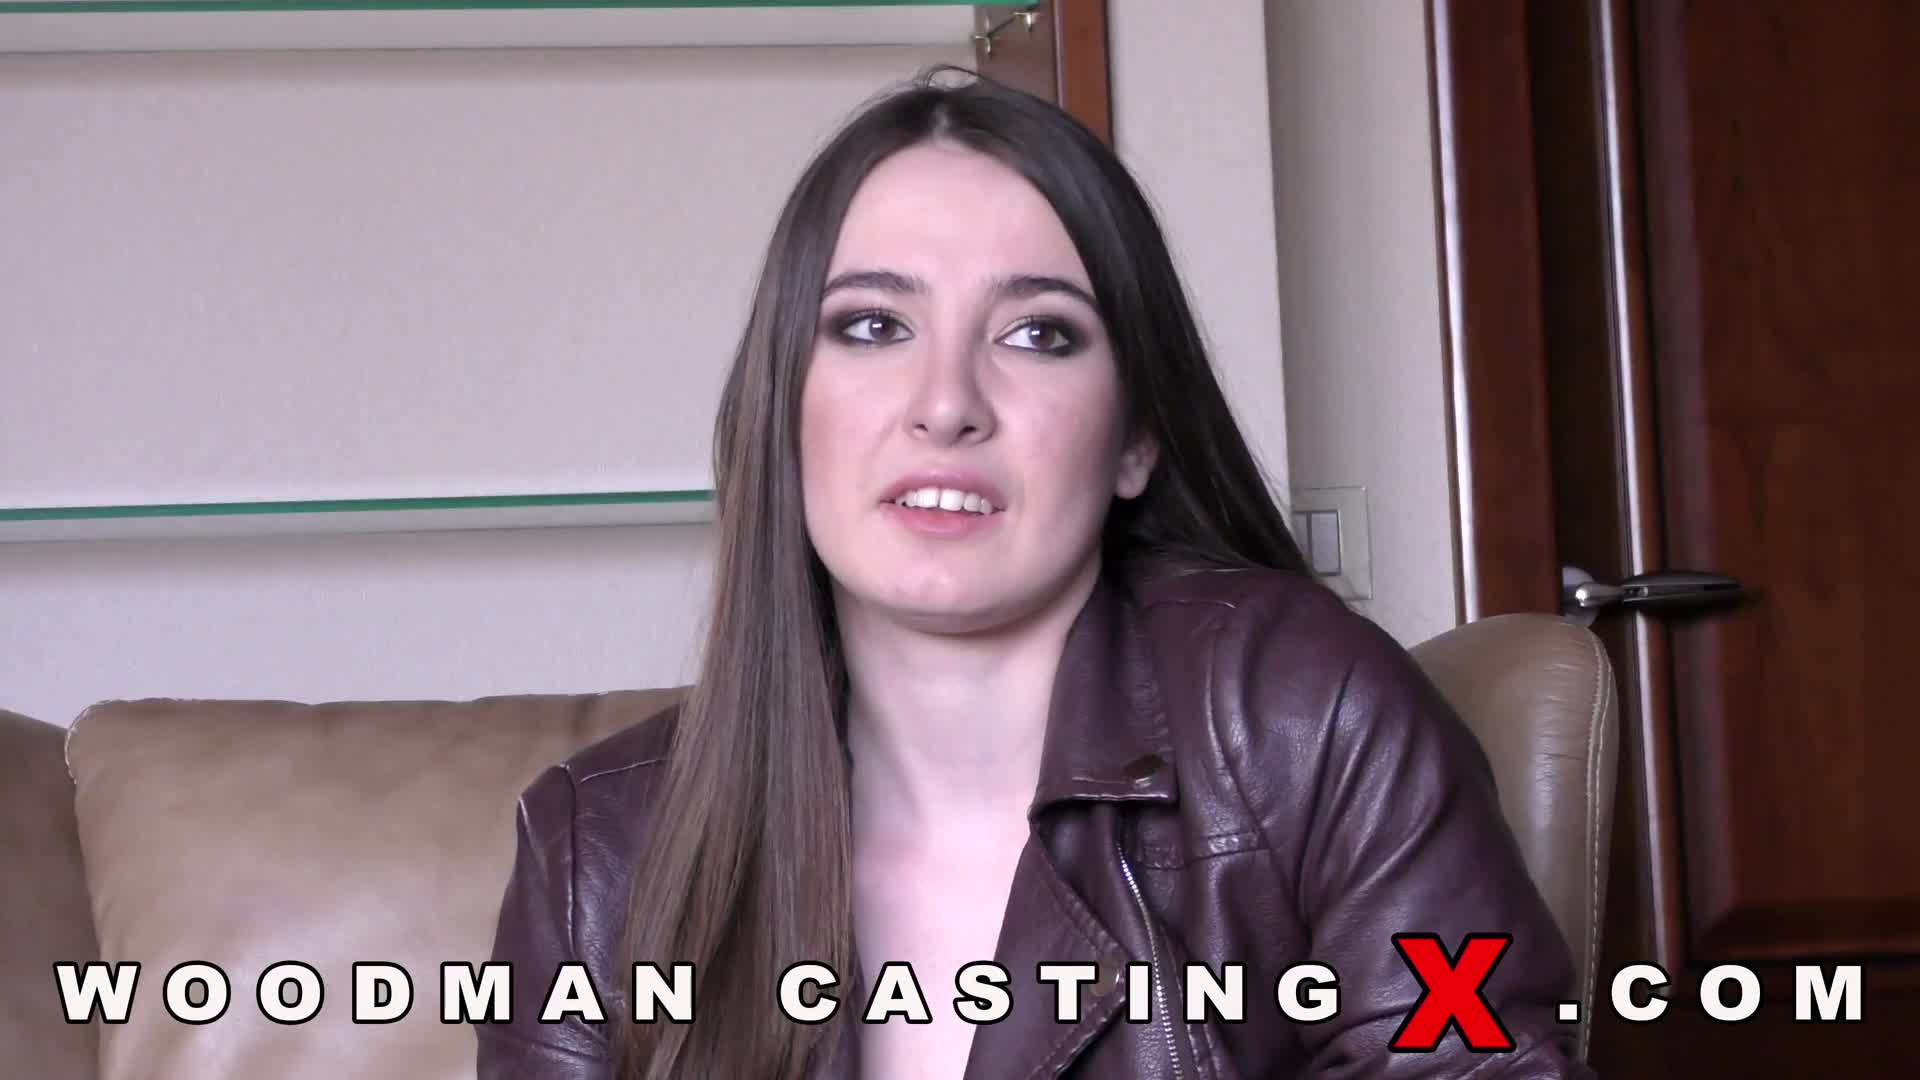 Com woodman casting x Woodman Casting